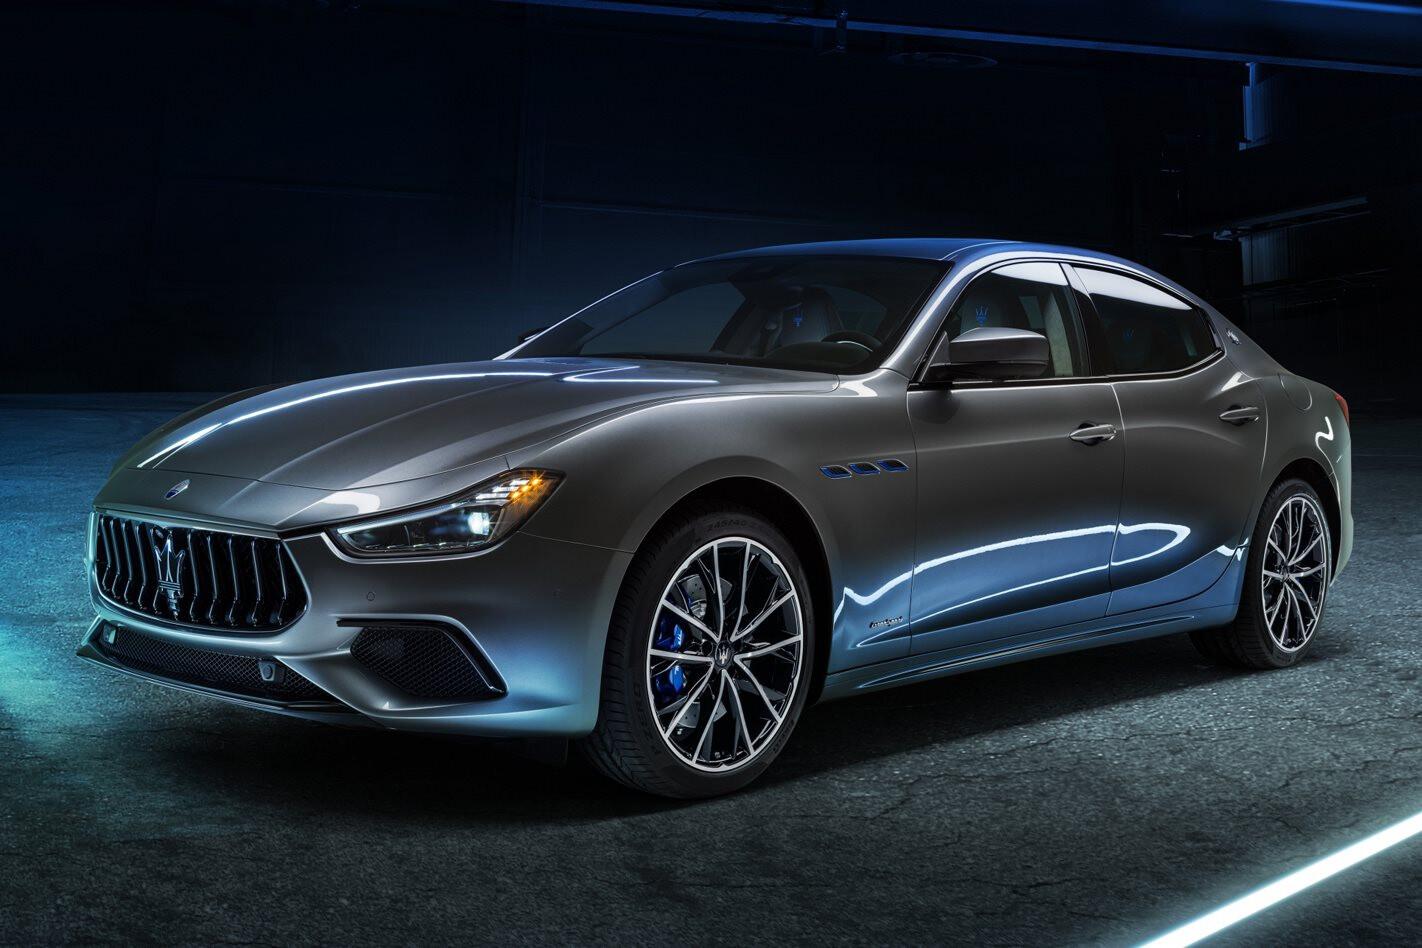 2020 Maserati Ghibli Hybrid